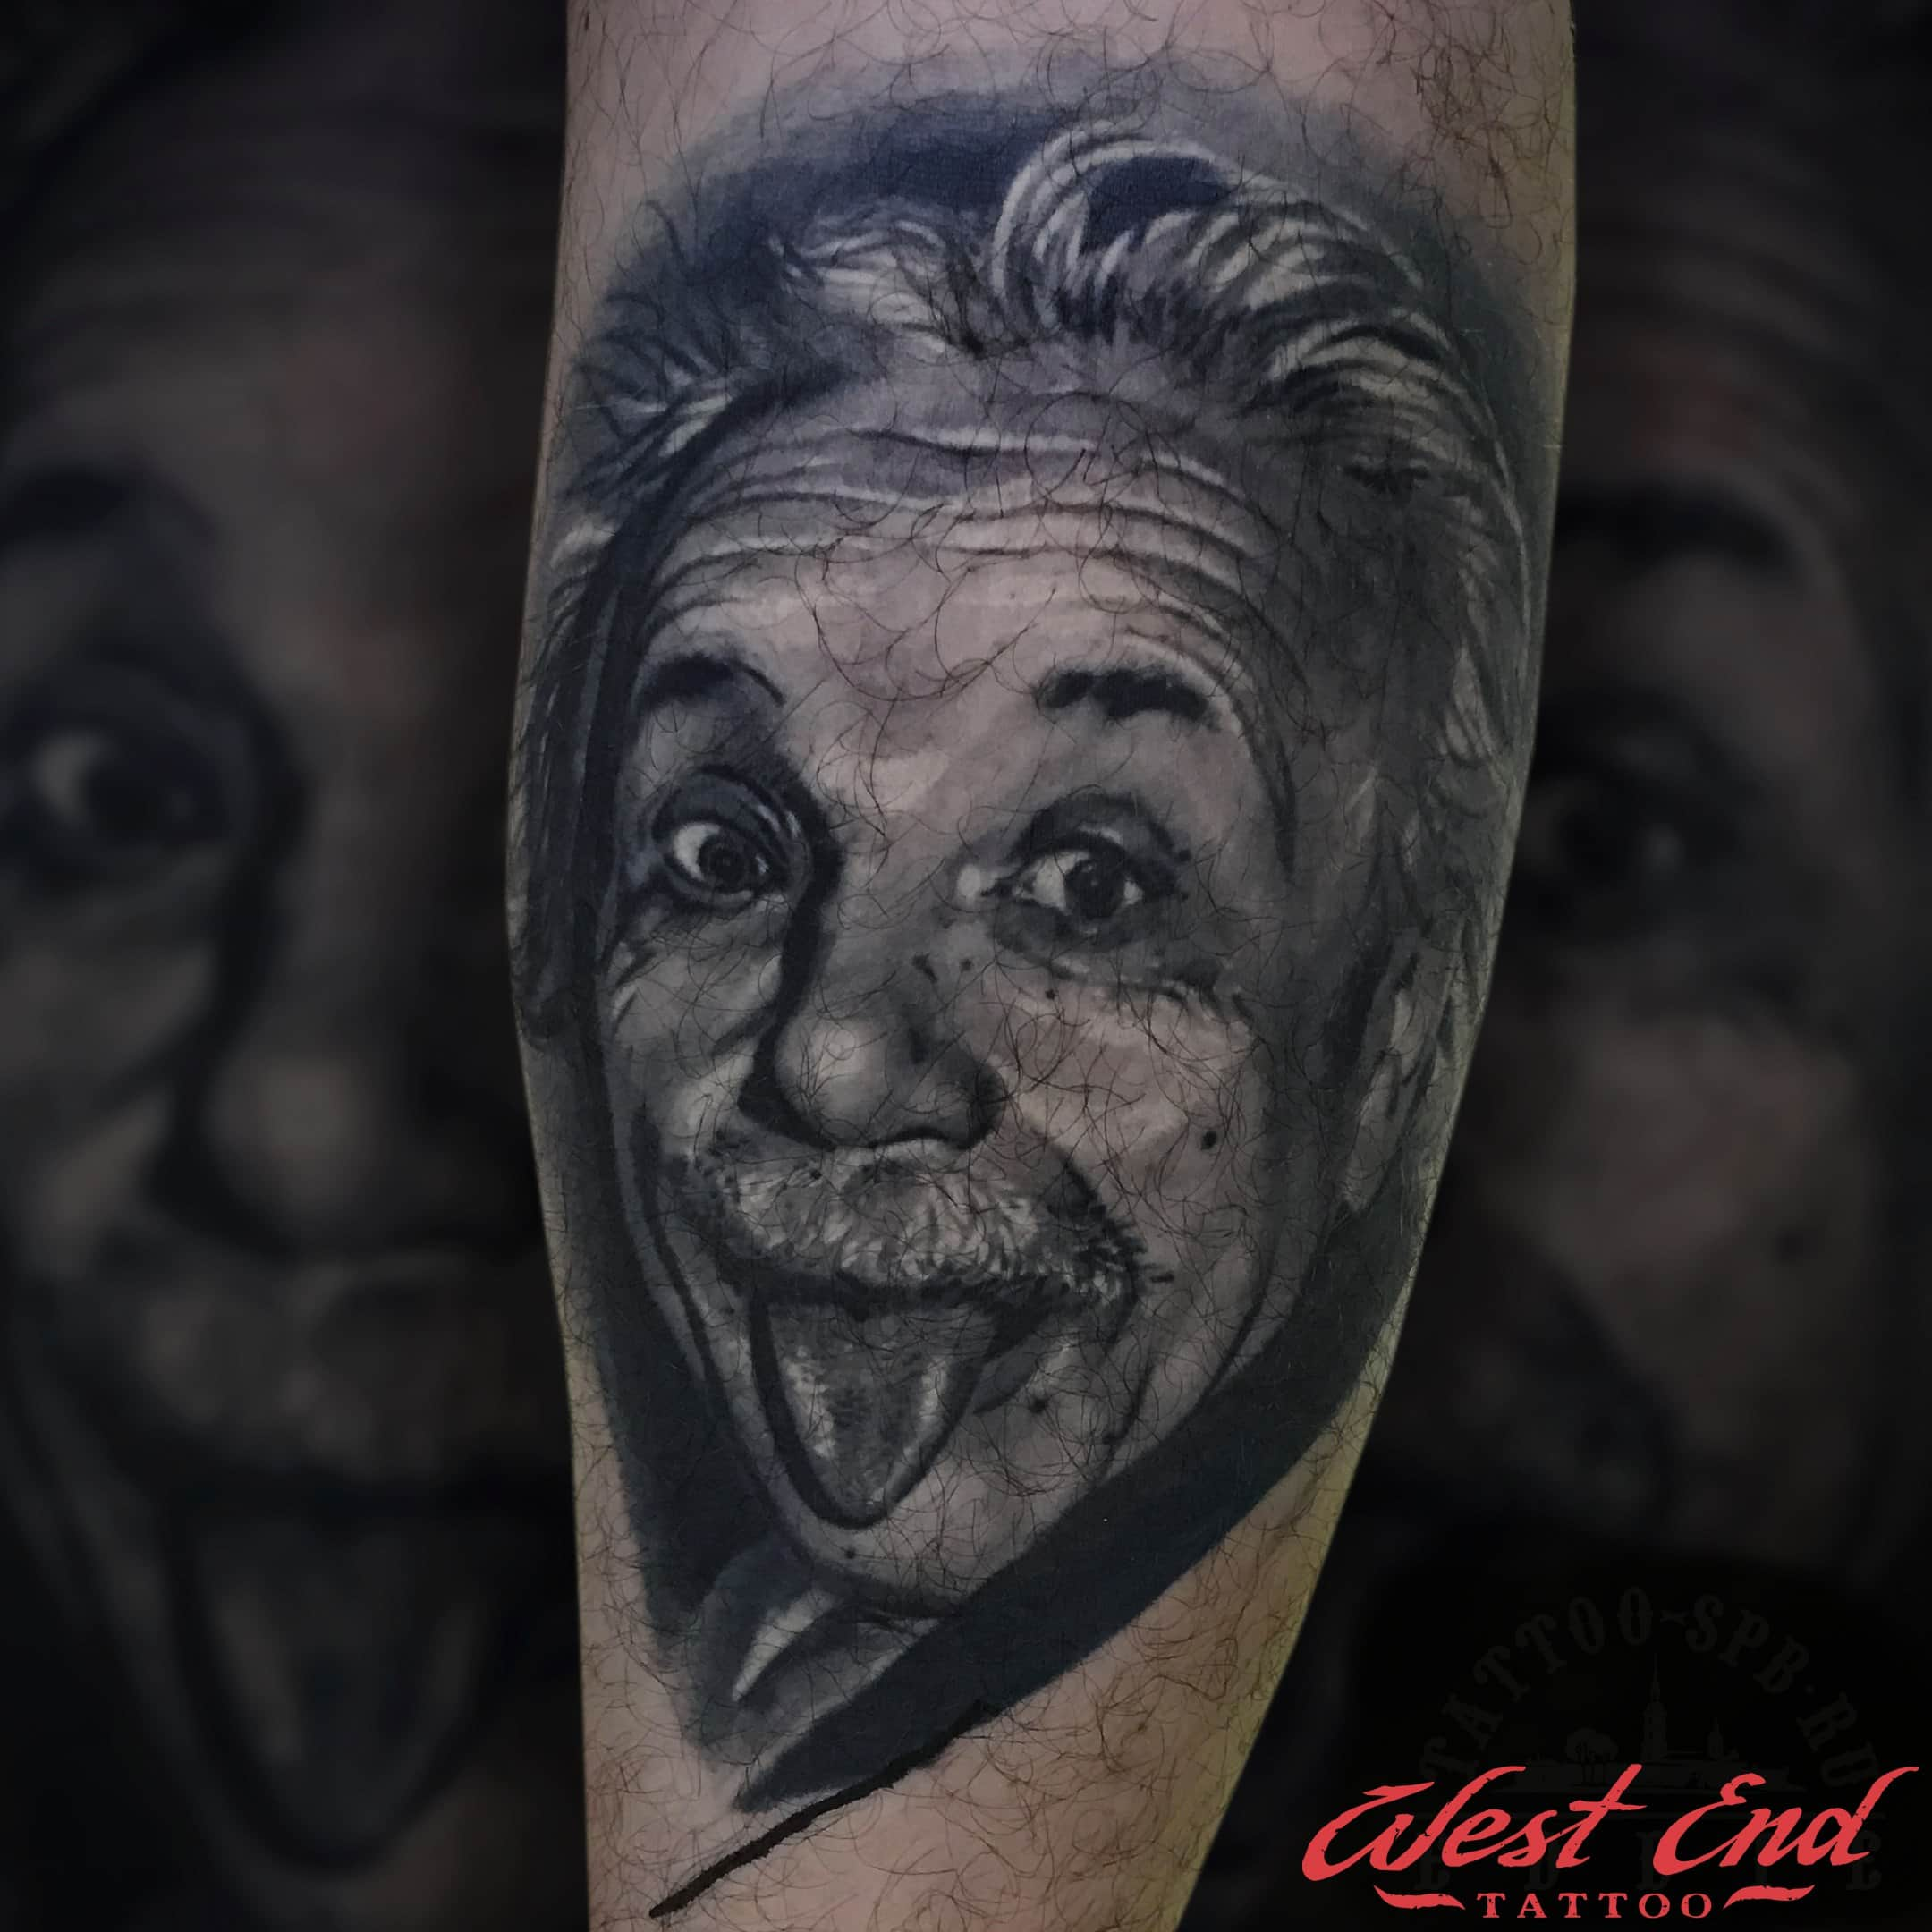 Тату портрет Эйнштейна на руке